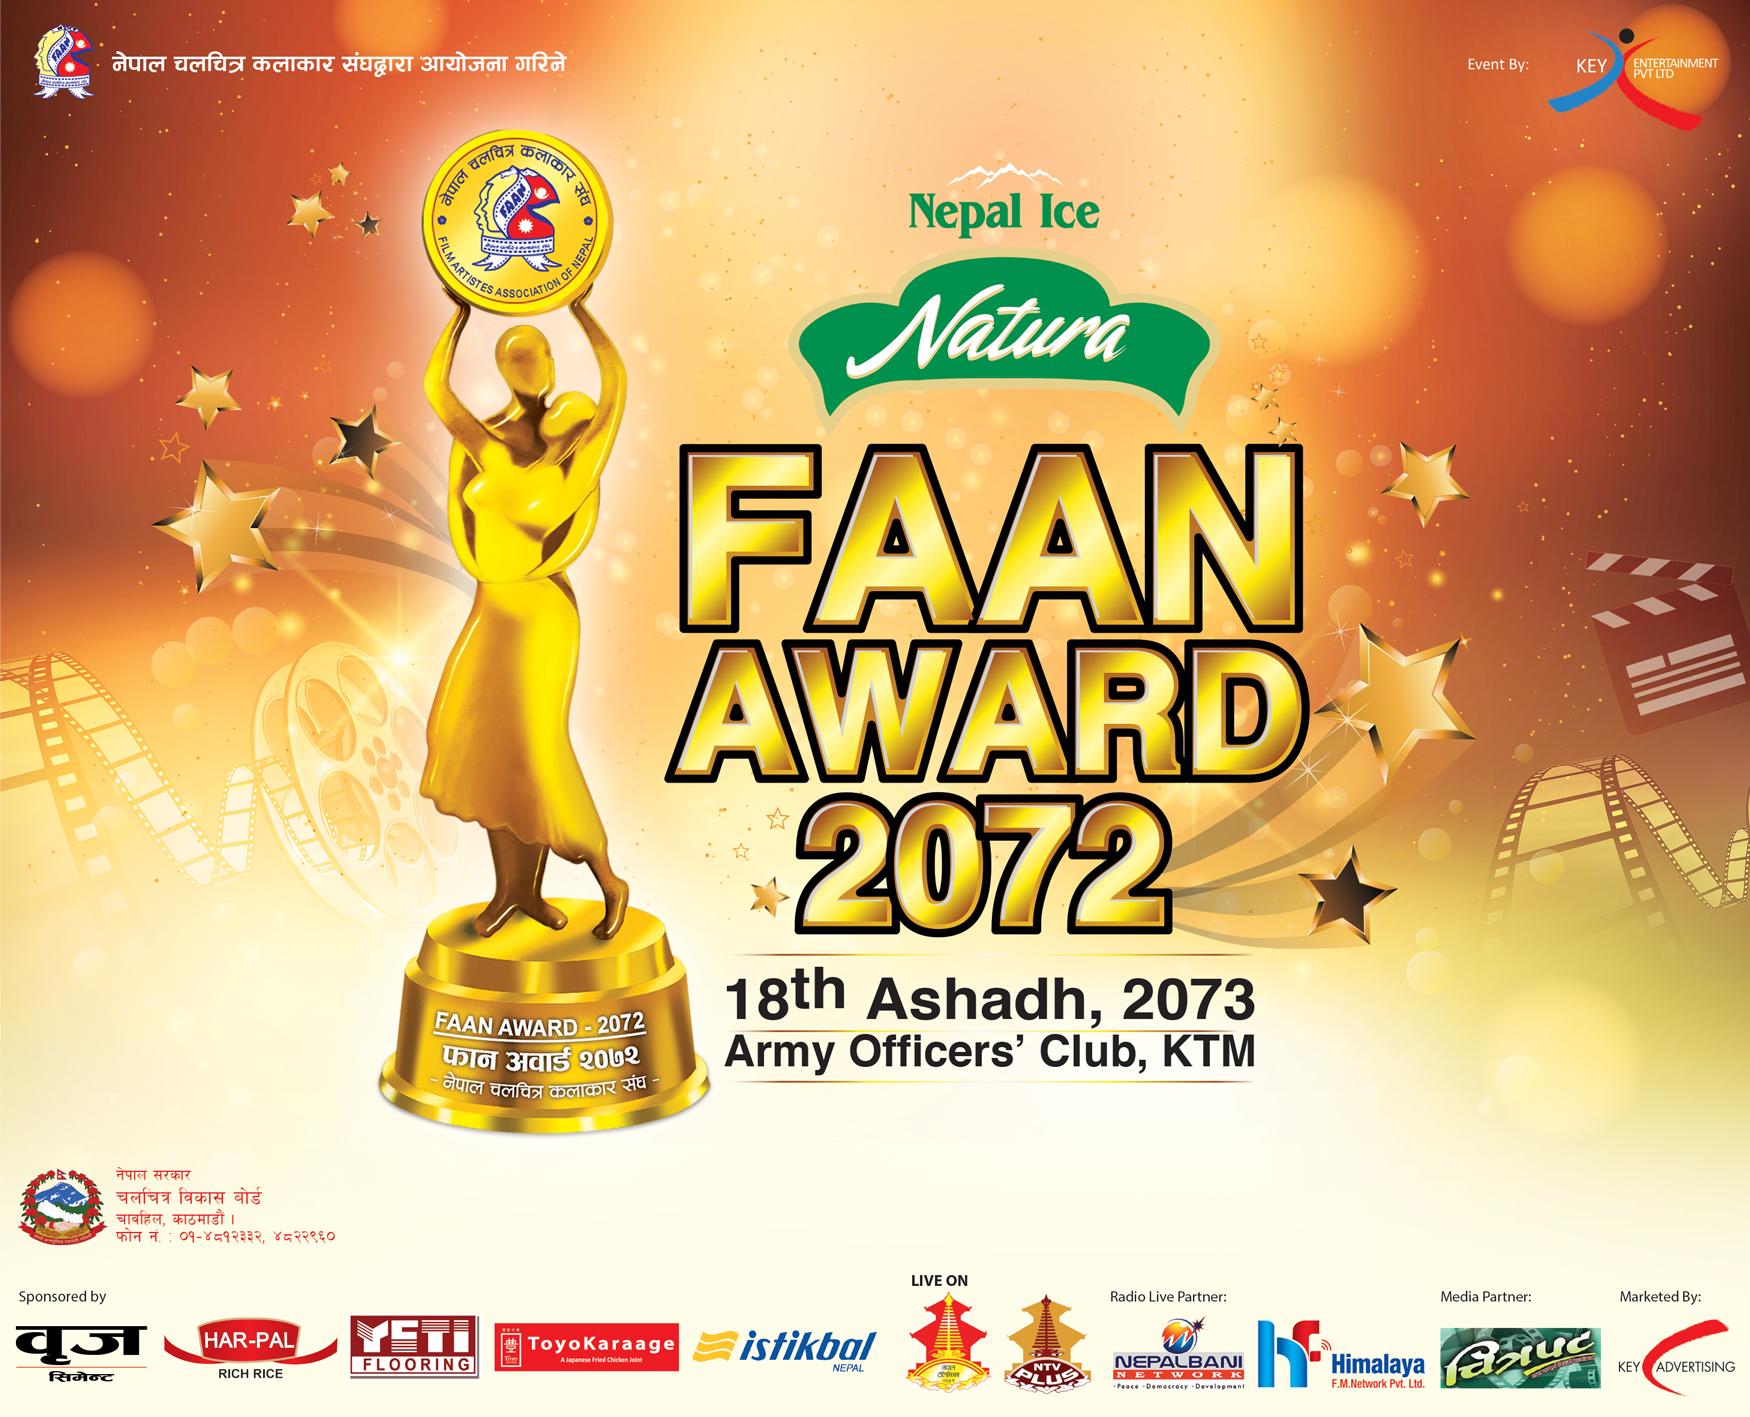 FAAN AWARD